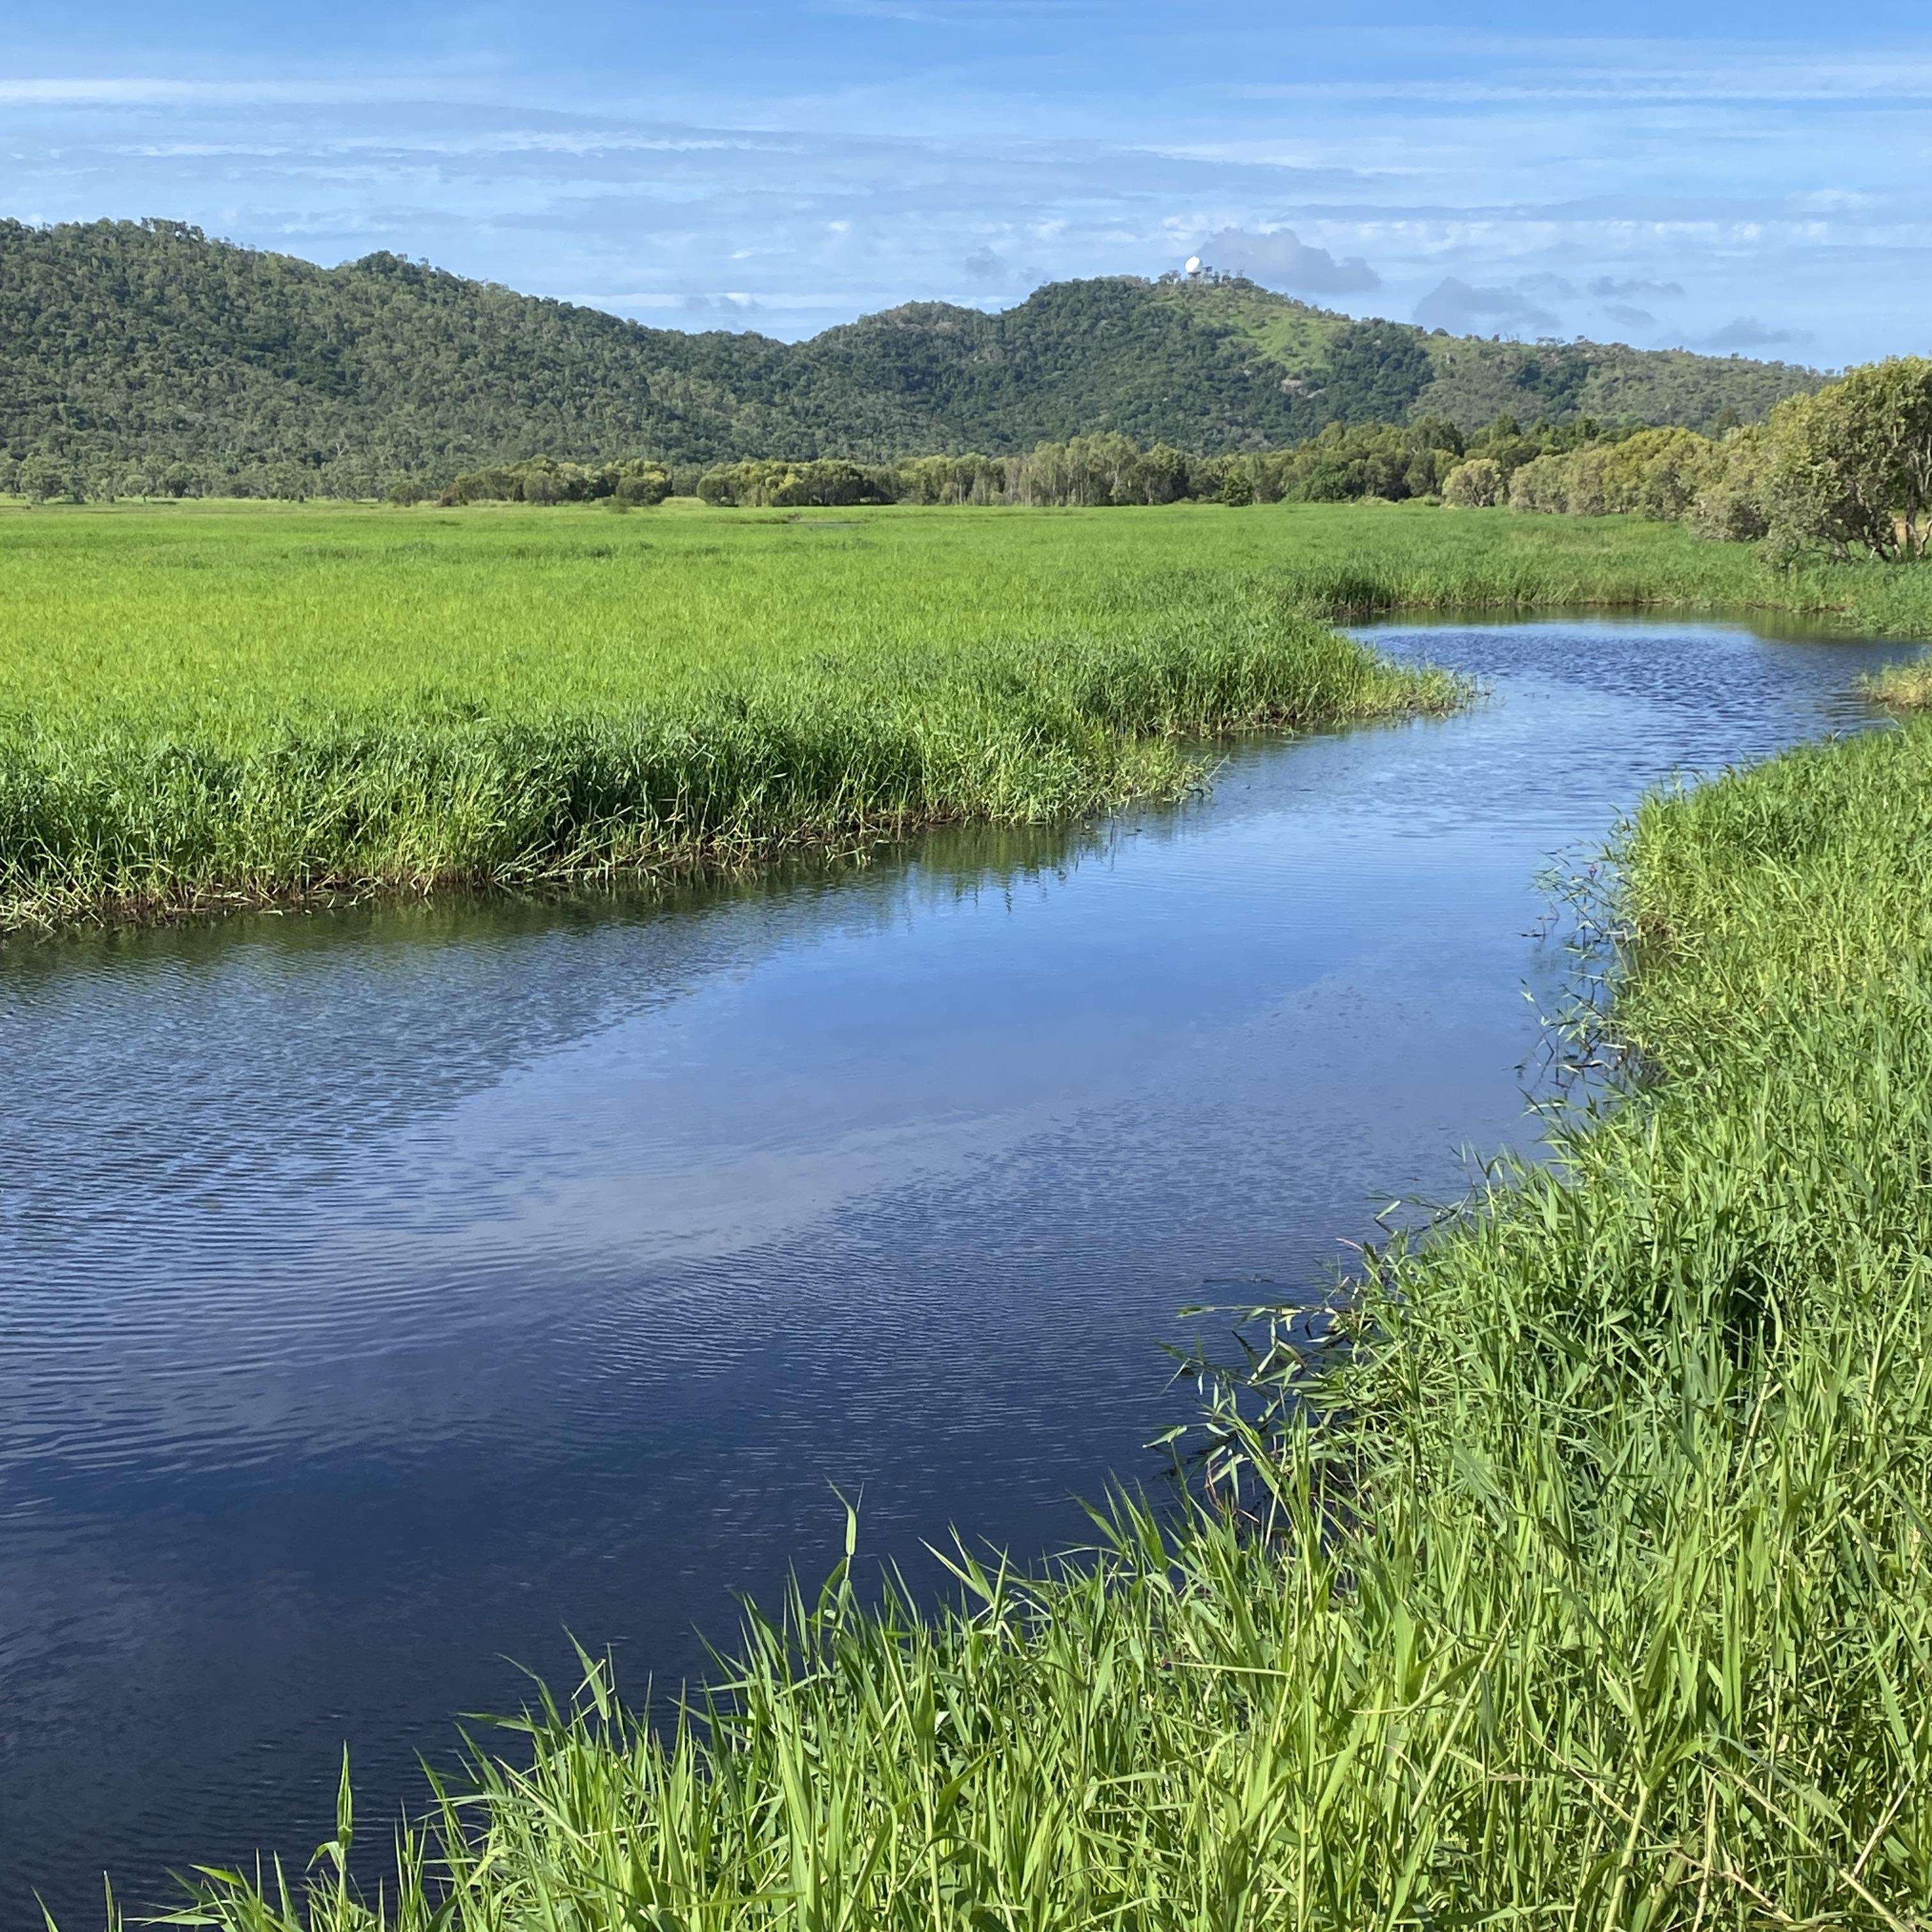 Die Townsville Common-Wetlands